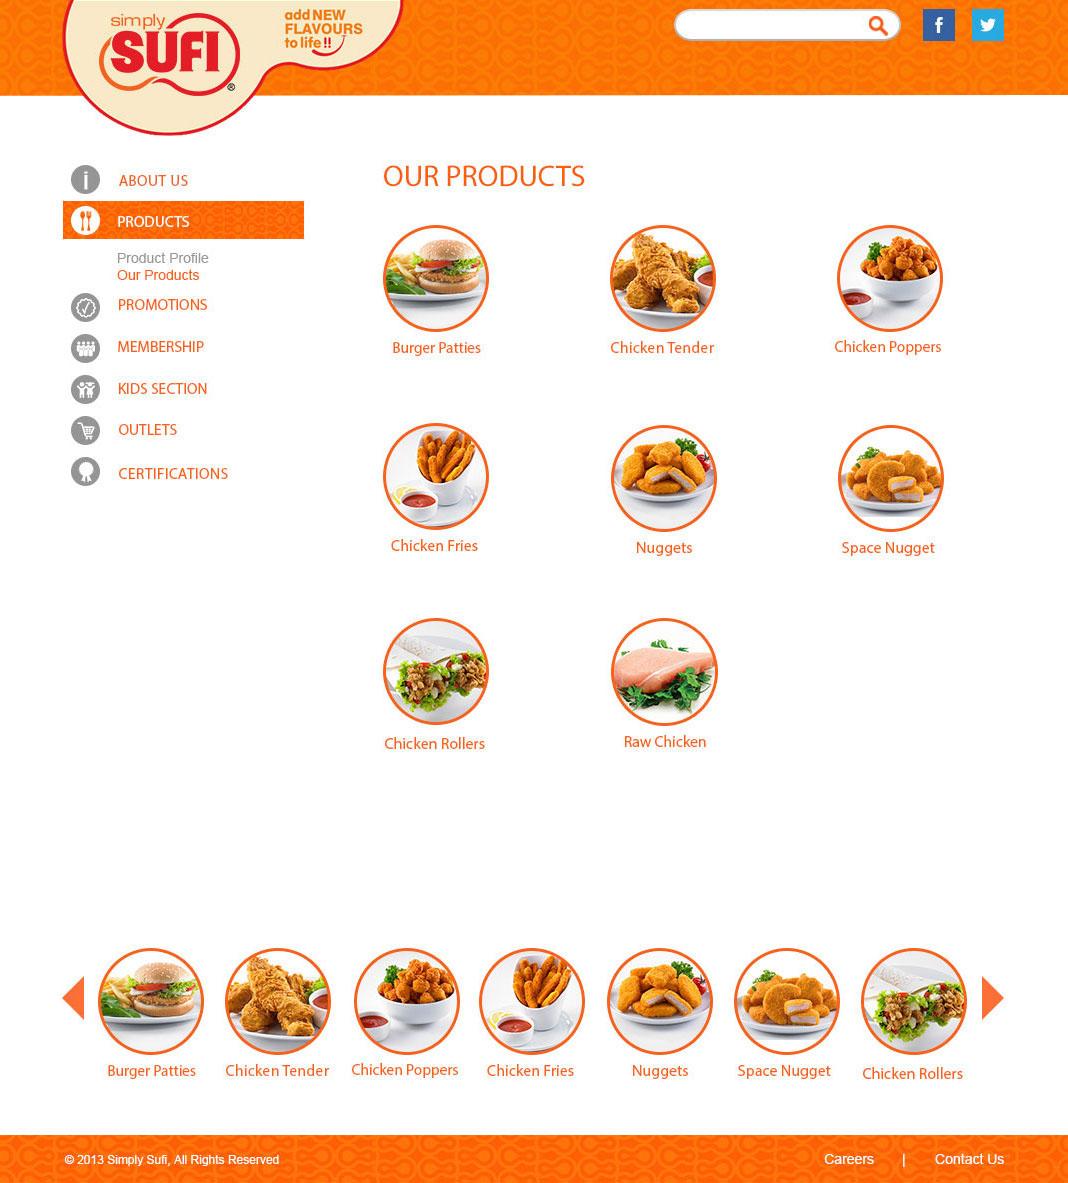 graphic design UI/UX Web site sufi simply Food